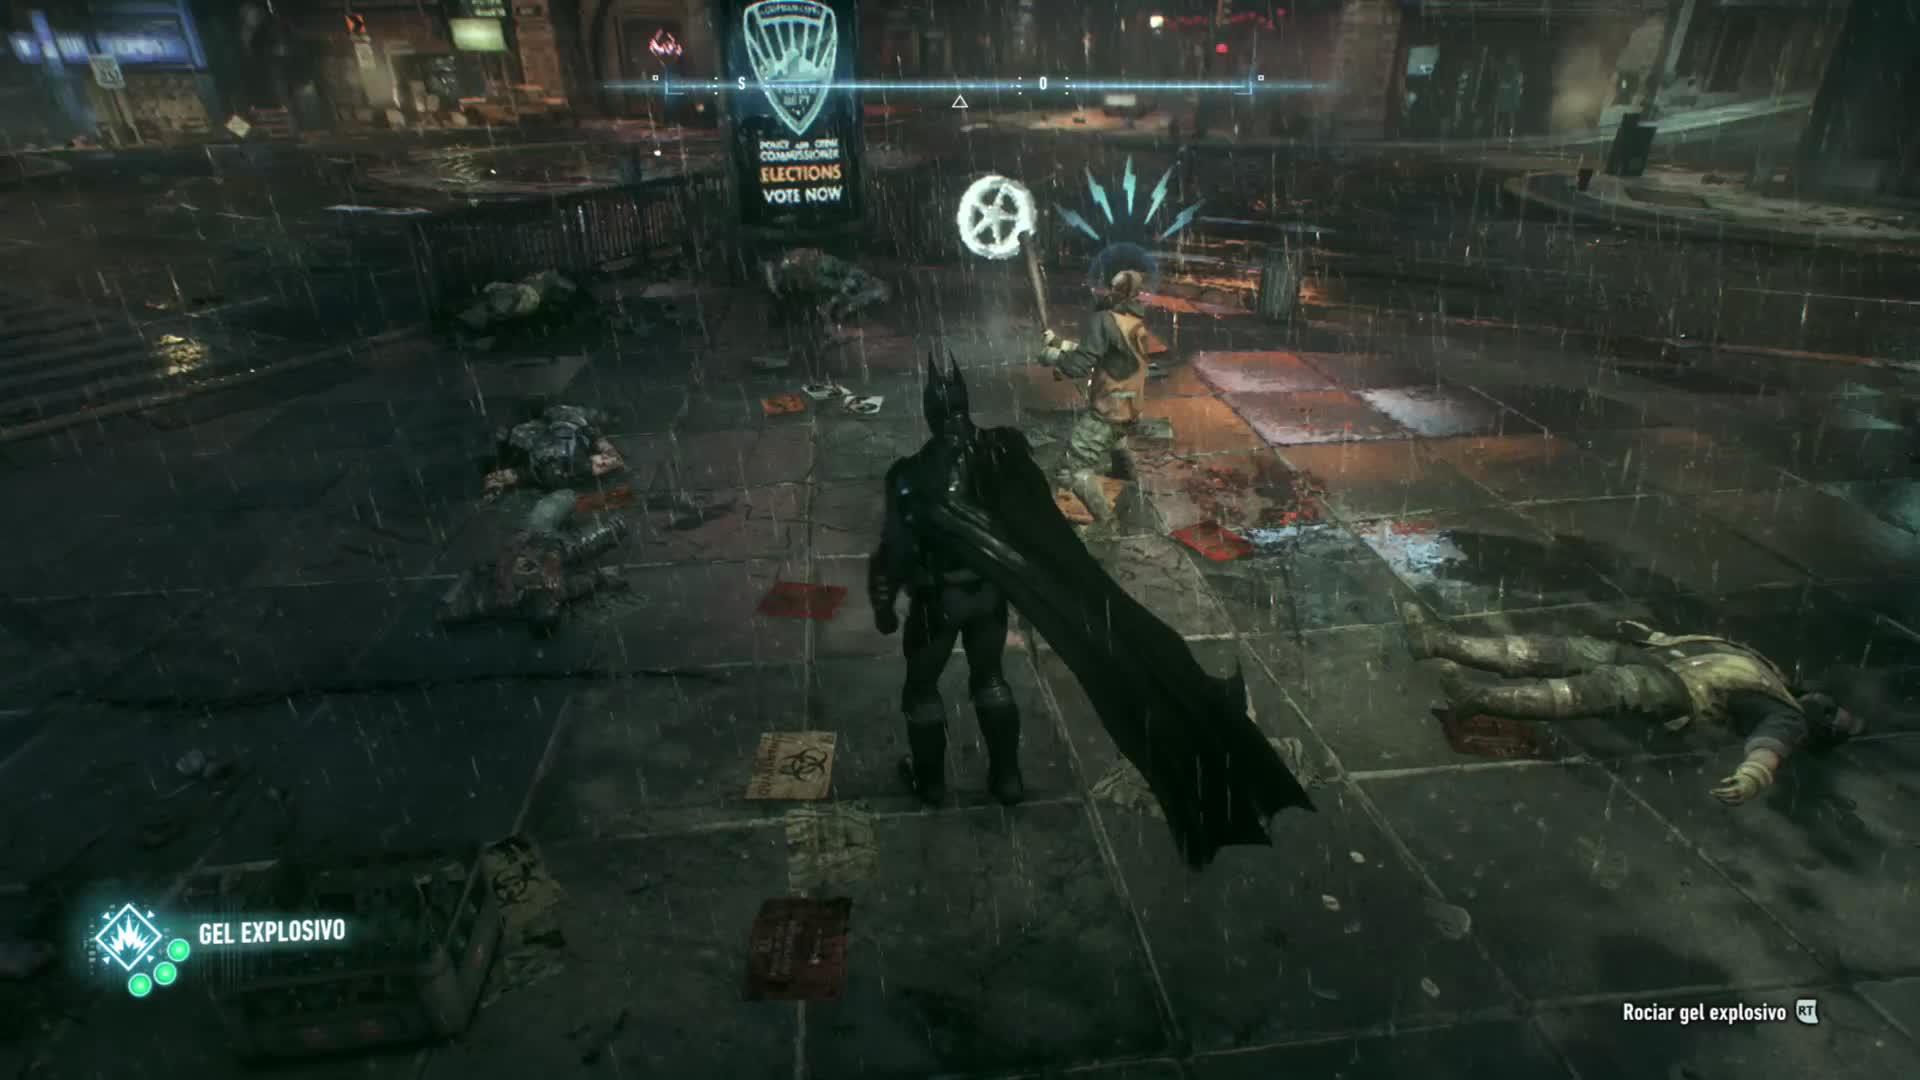 BatmanArkhamKnight, Kododo, gamer dvr, xbox, xbox one, ostion GIFs